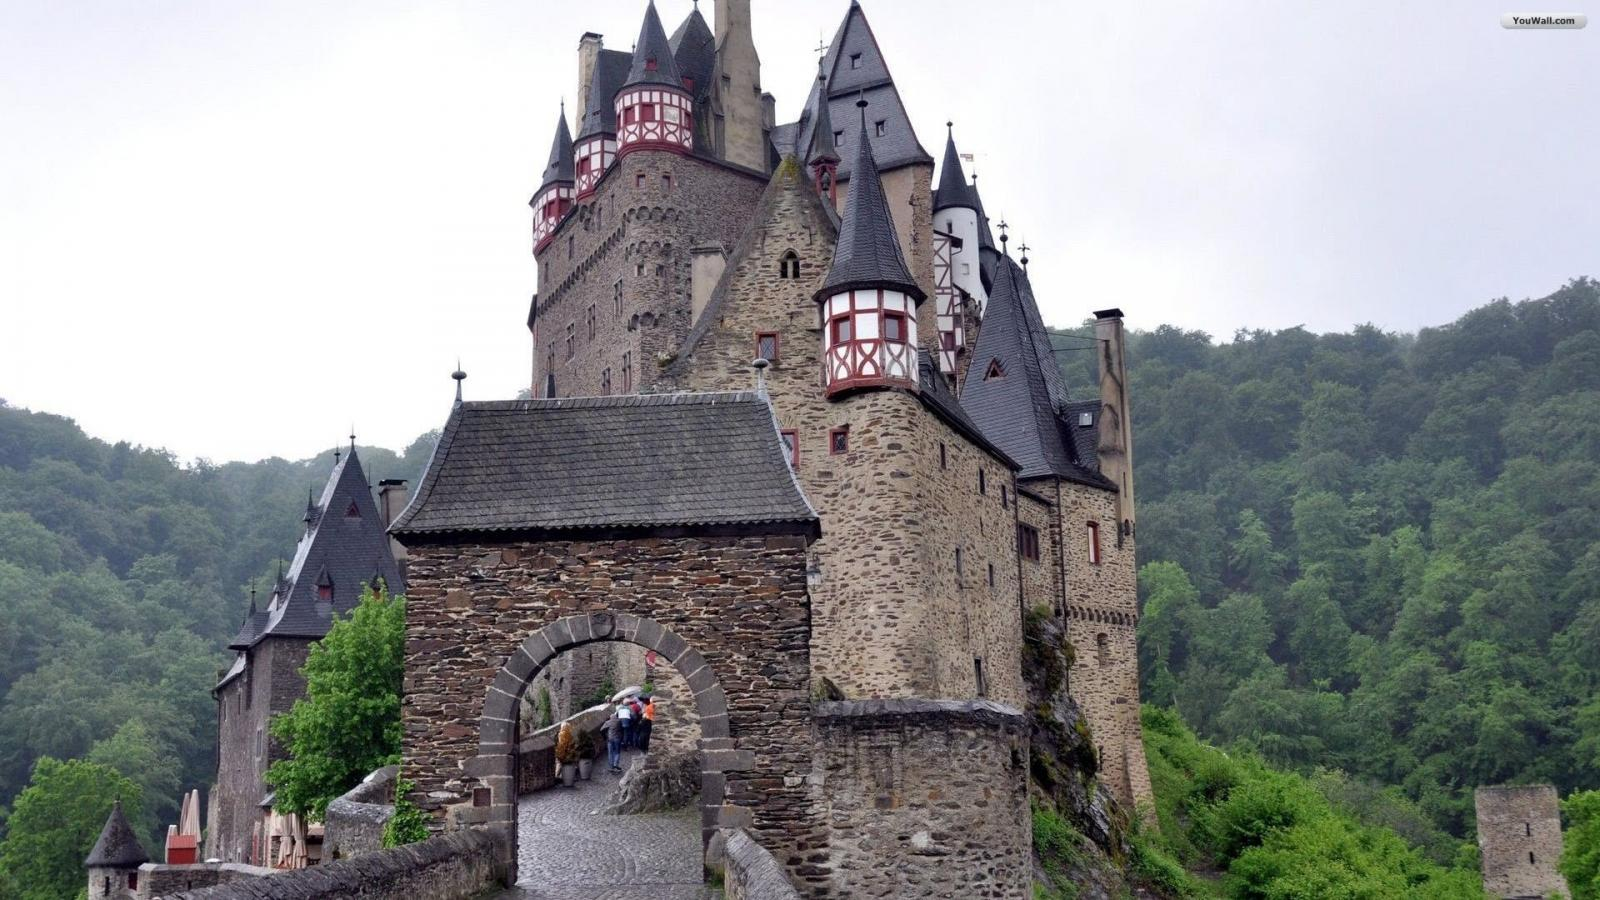 German Castle Wallpaper   wallpaperwallpapersfree wallpaper 1600x900